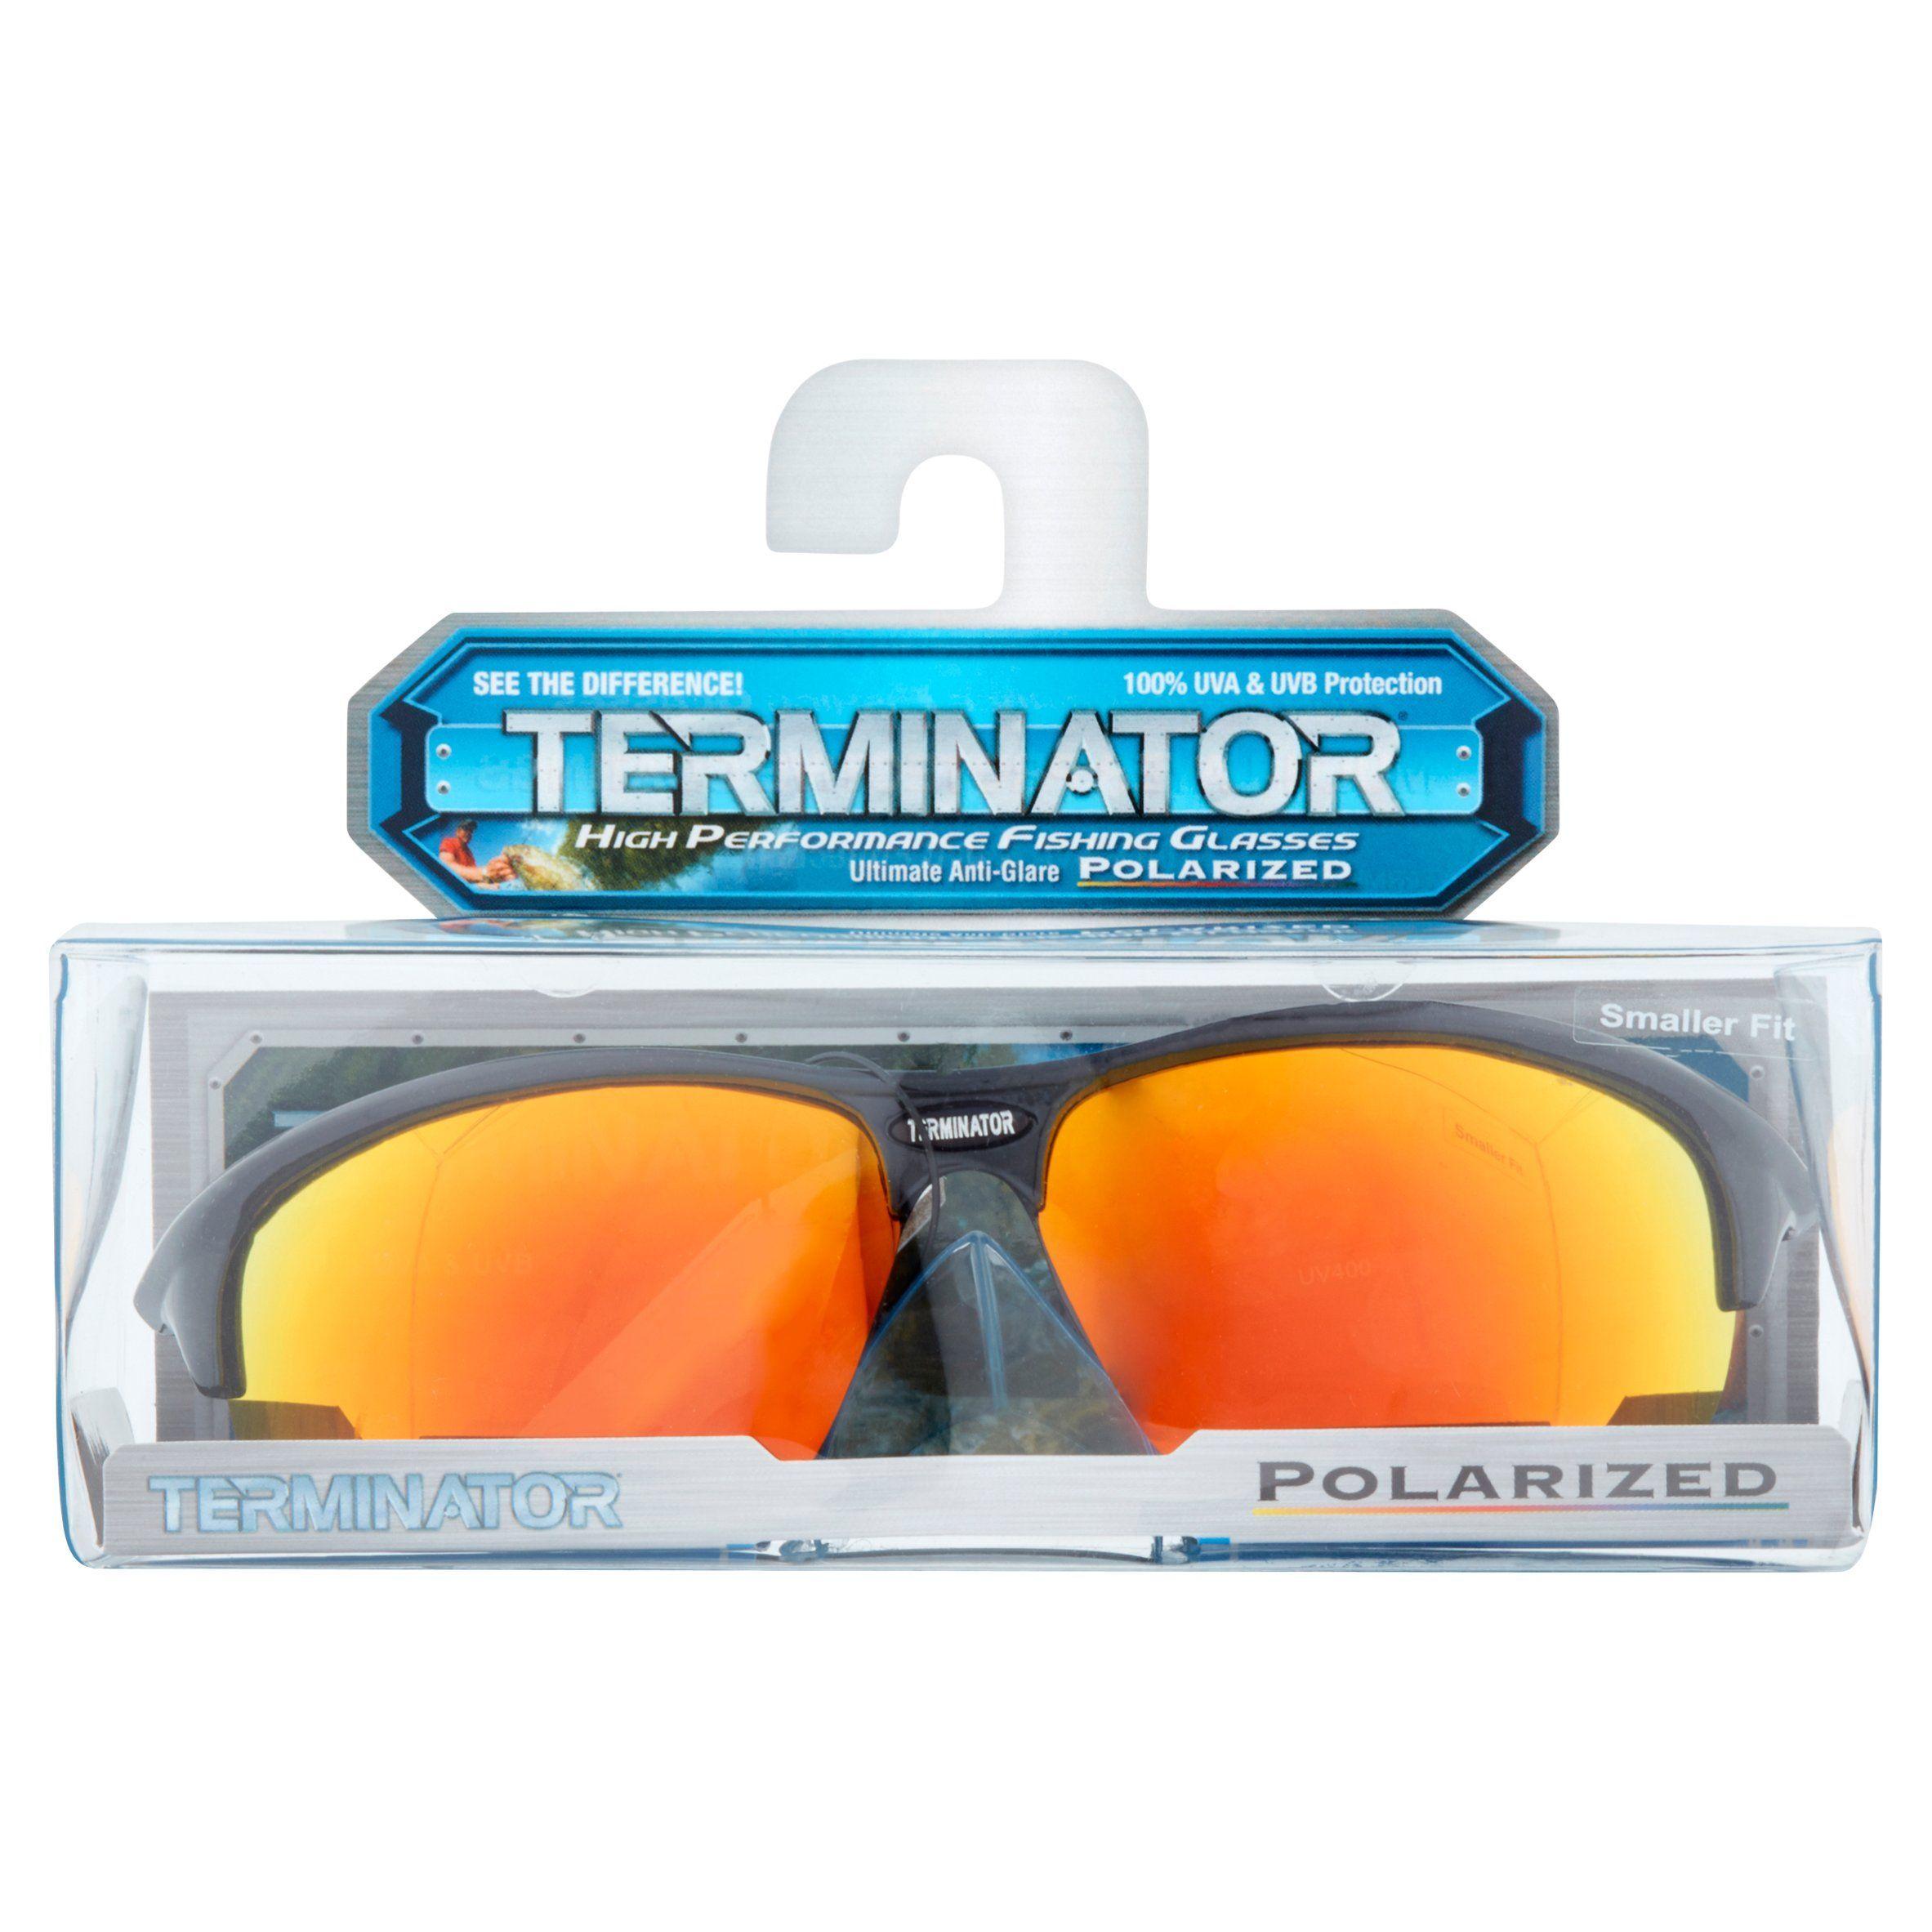 5d0f9cab15f0 Terminator Polarized Smallfit Sunglasses, Black